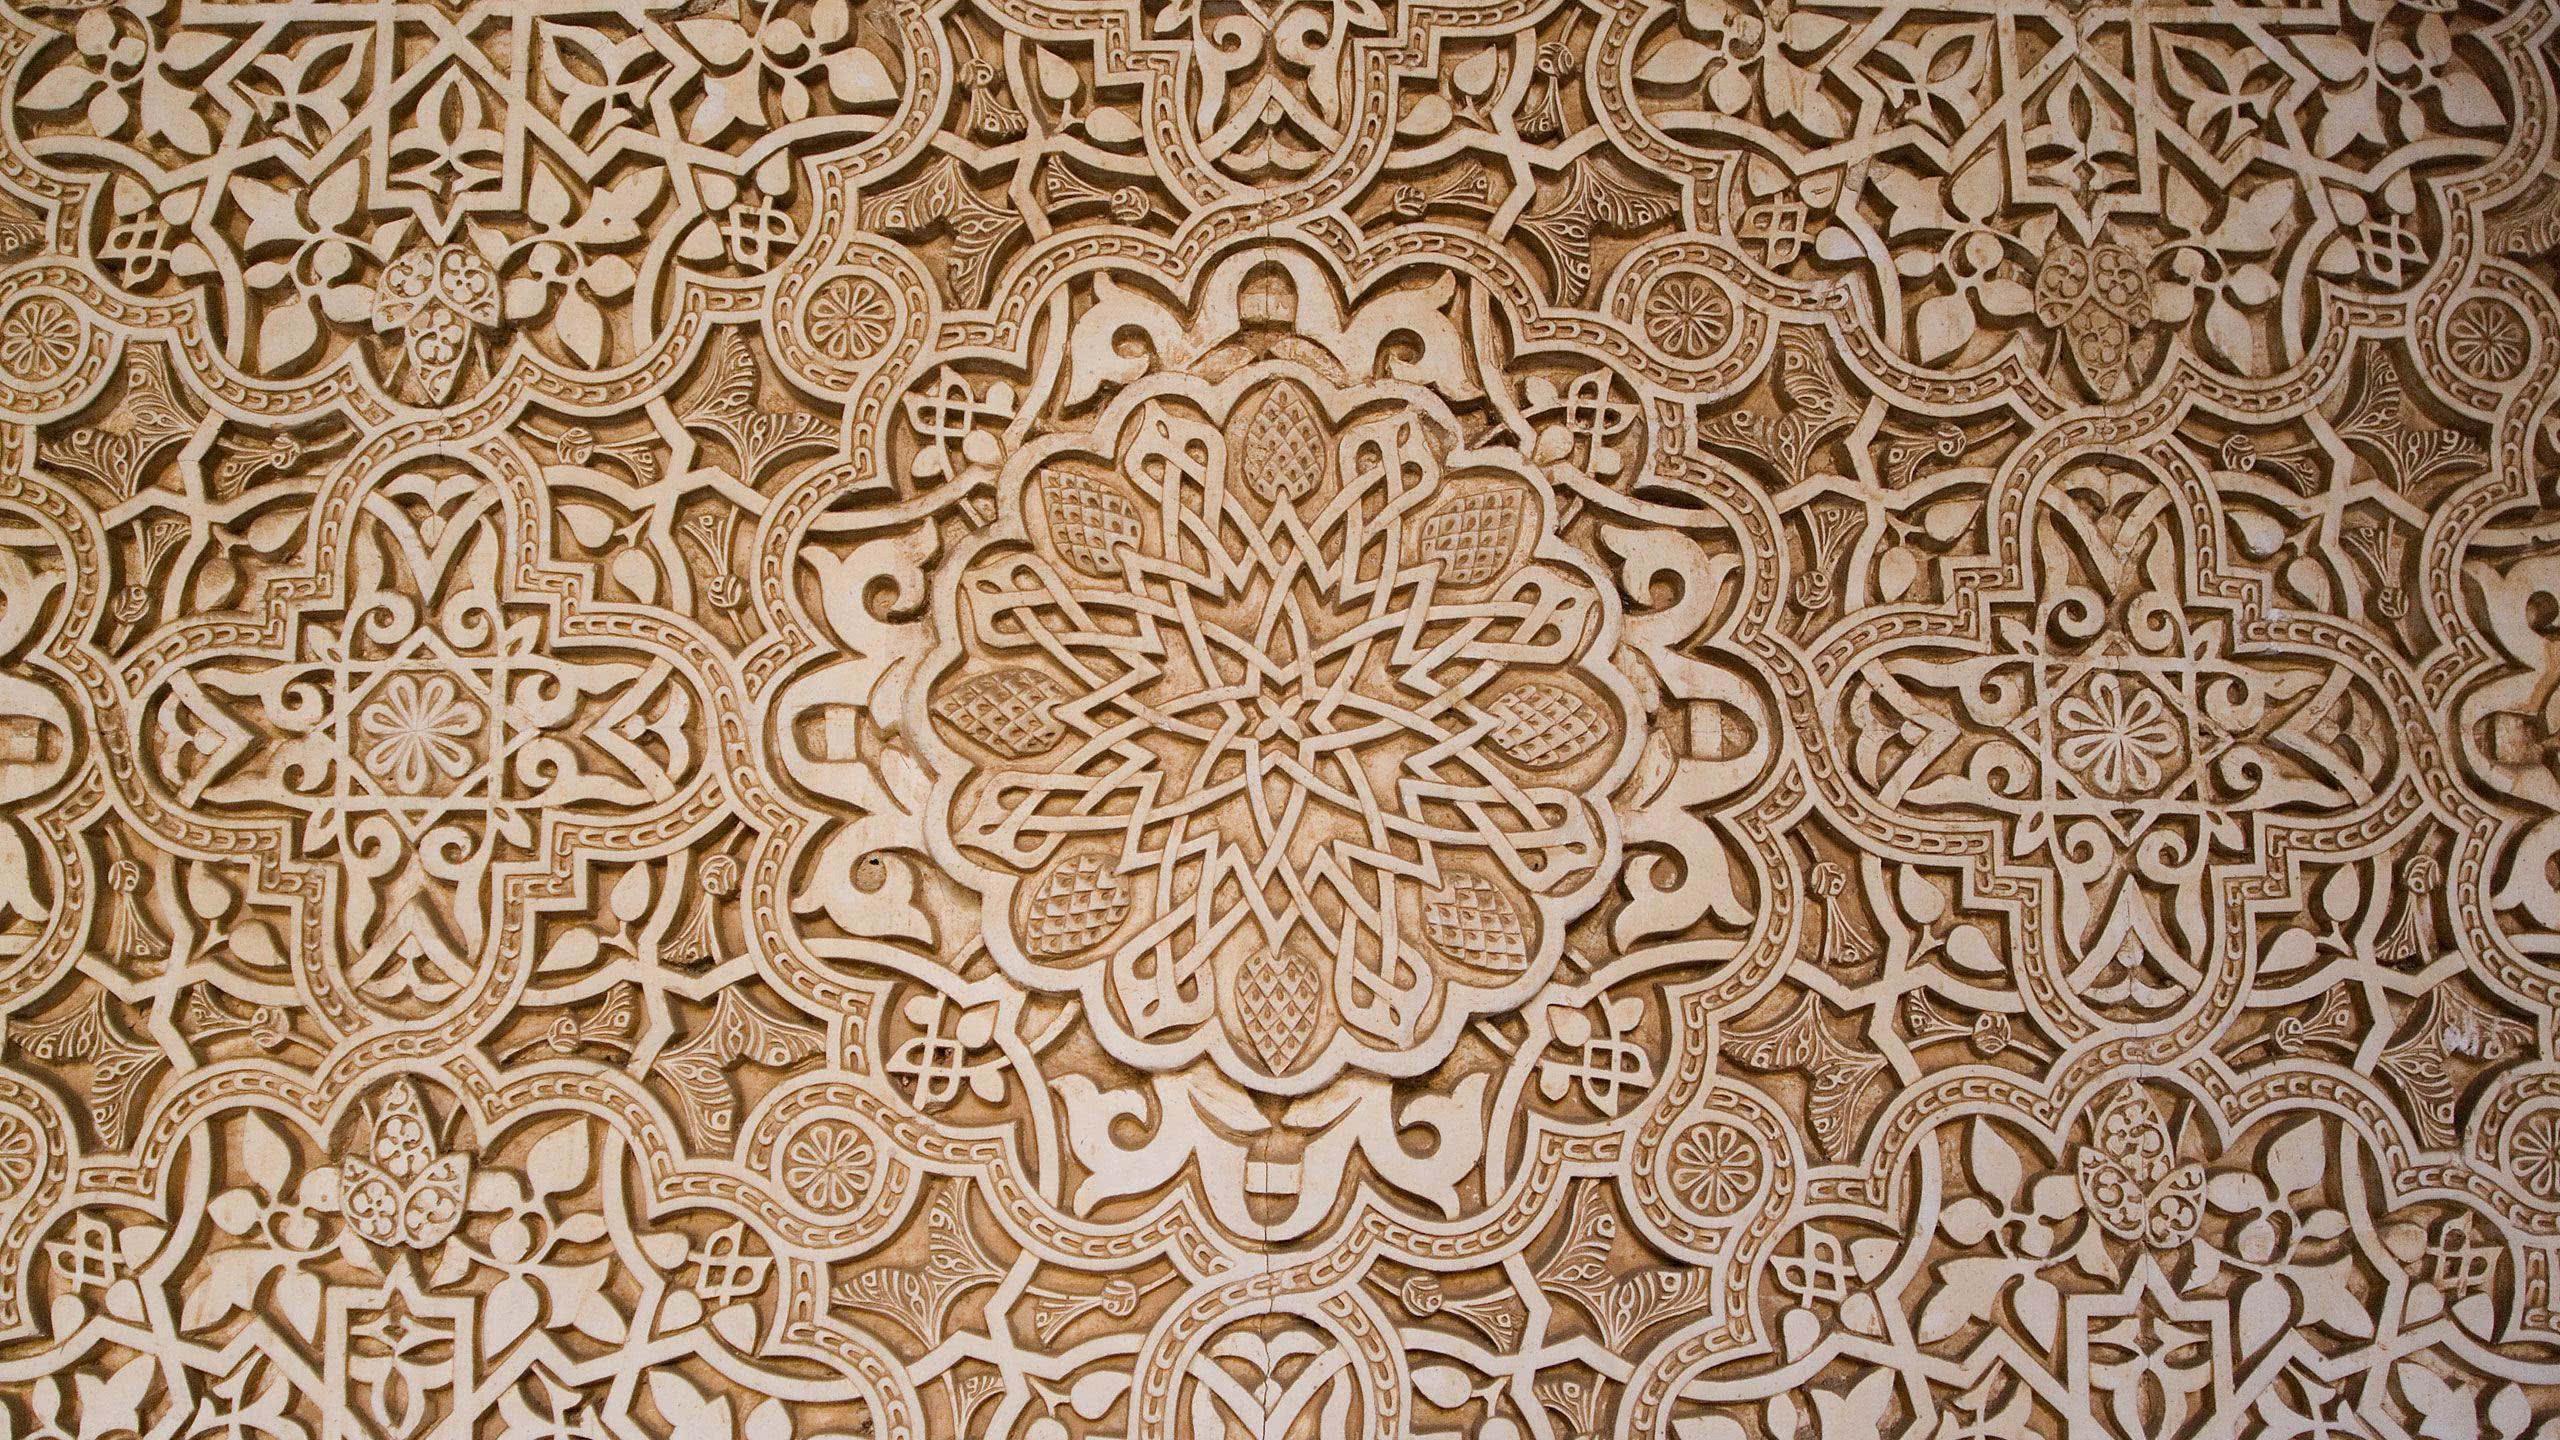 arabesque background wqhd 1440p wallpaper